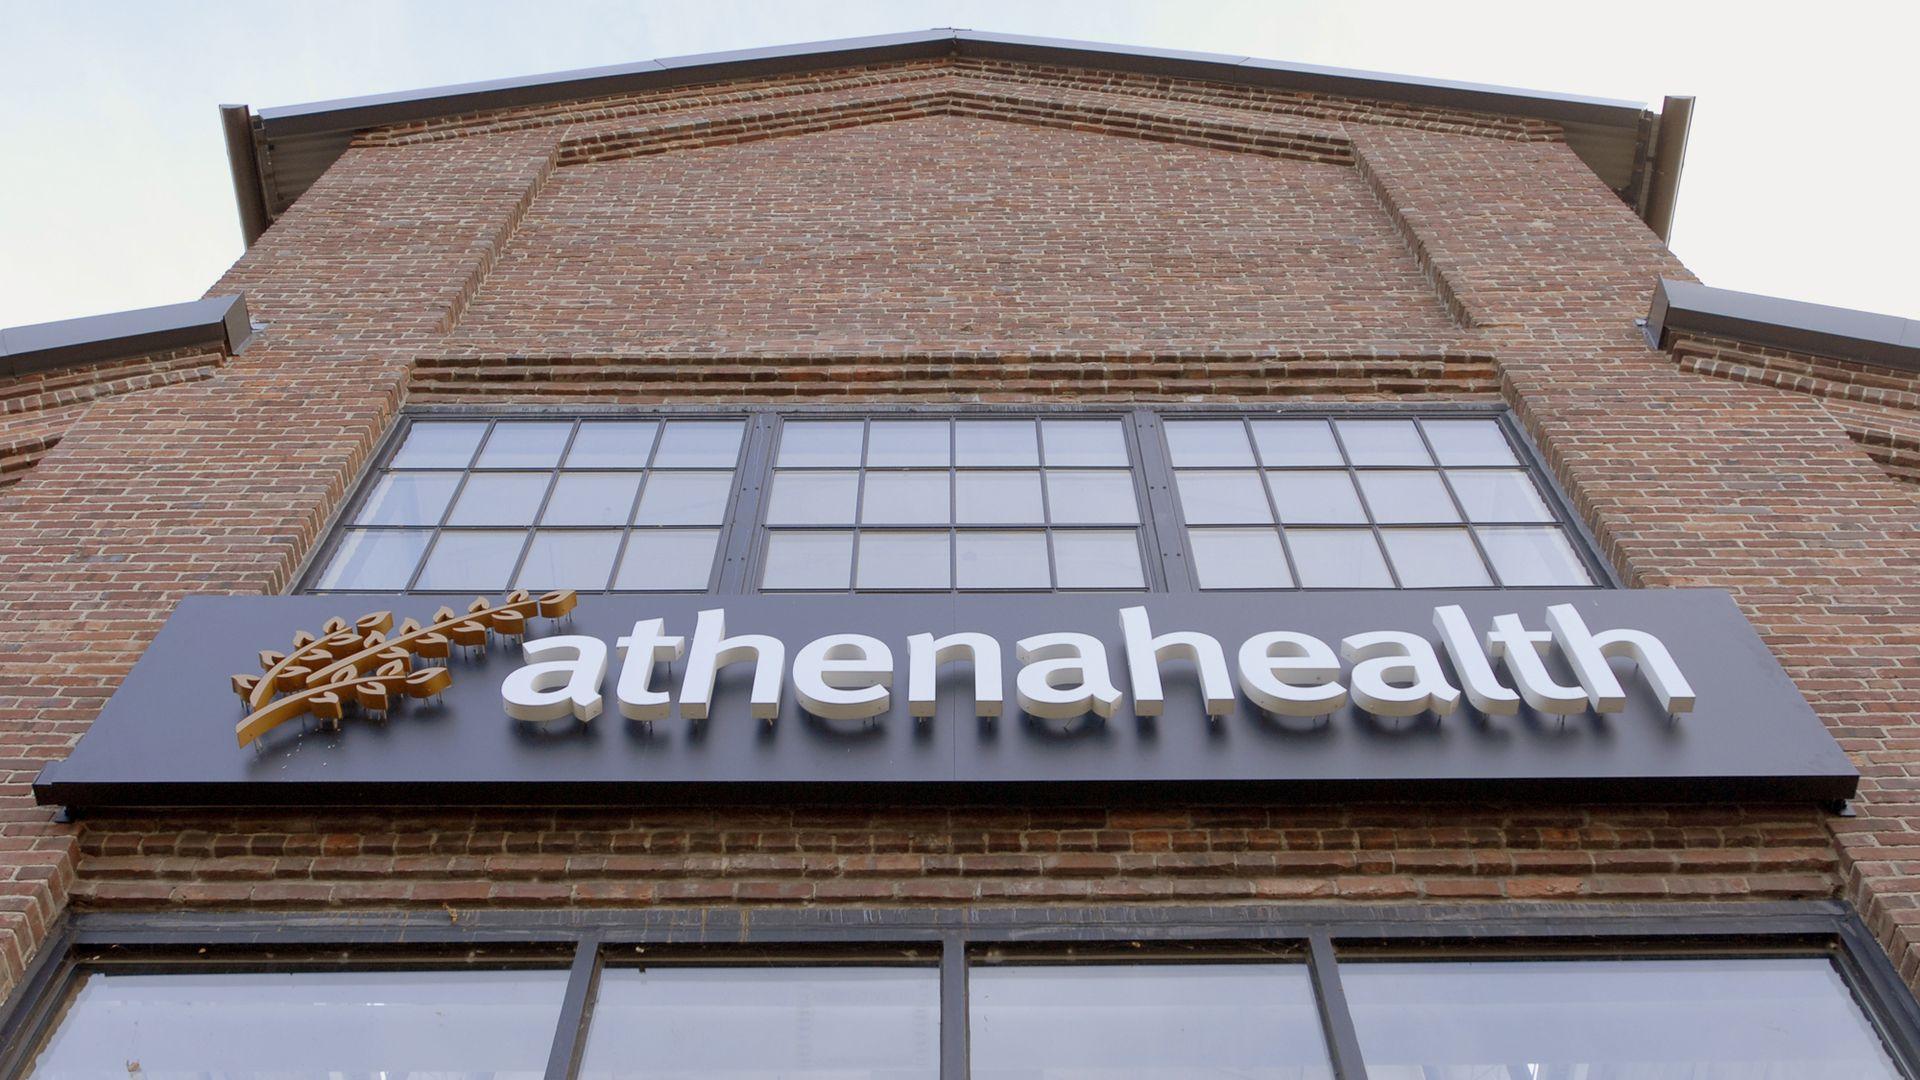 Athenahealth headquarters building in Massachusetts.